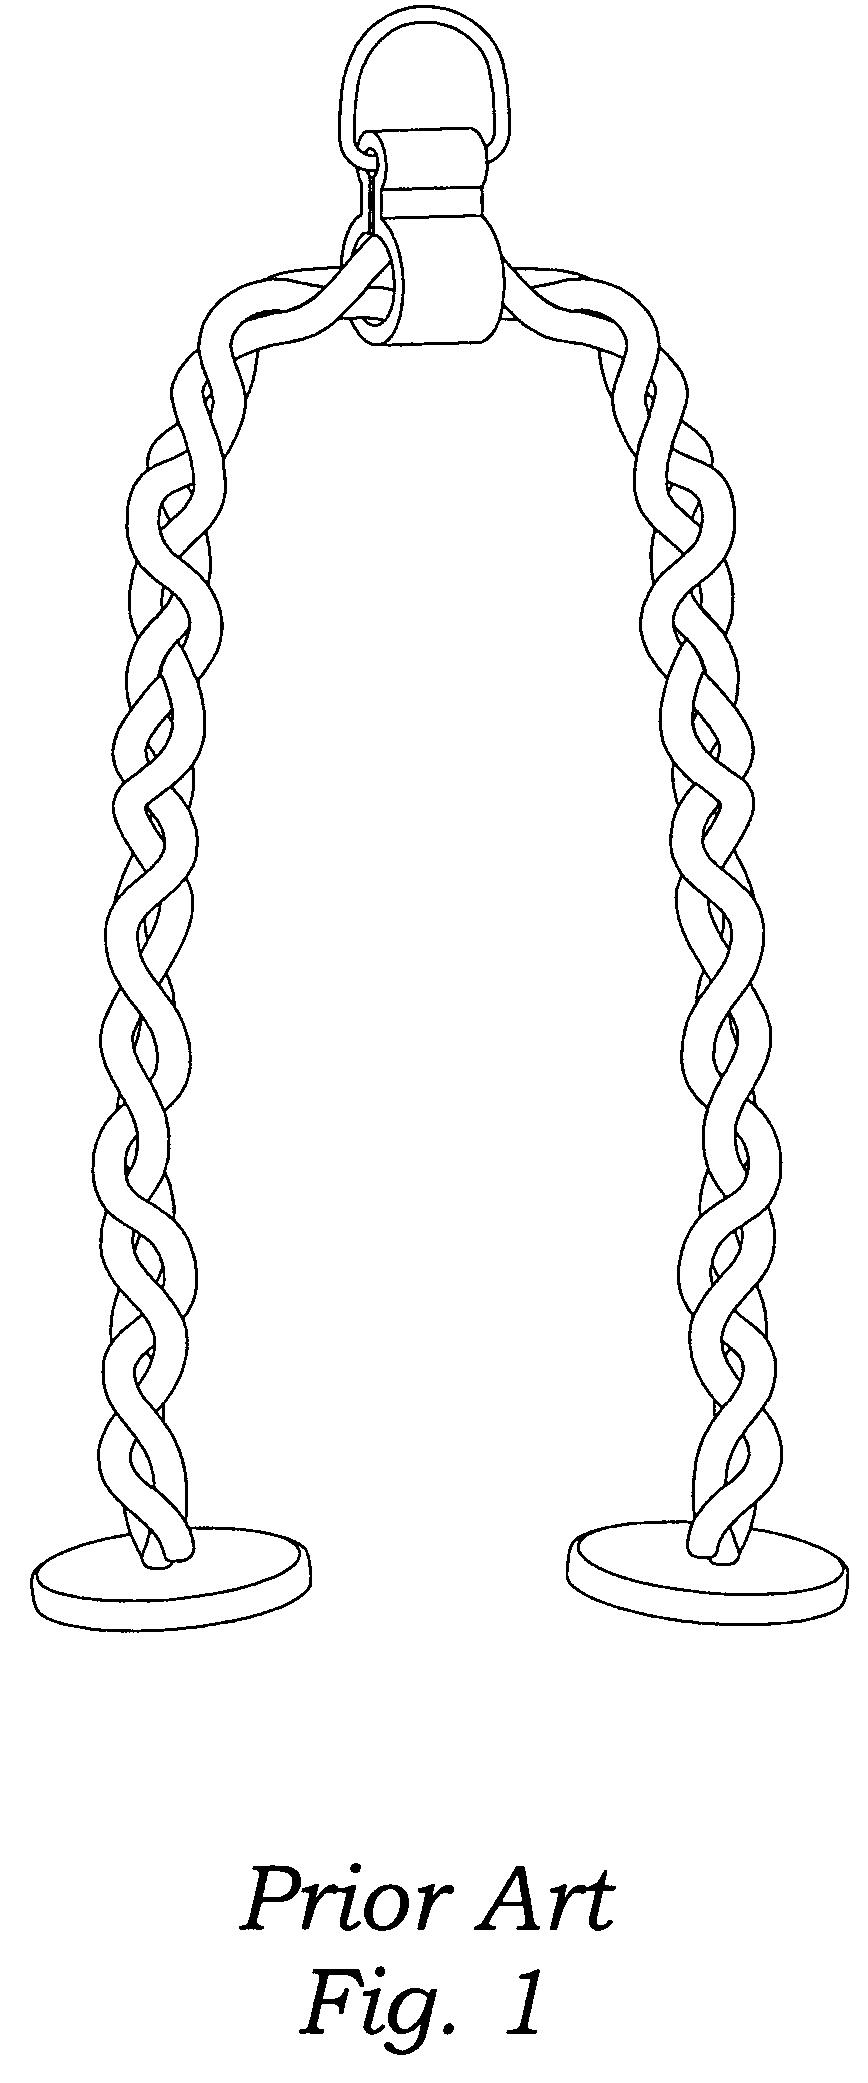 ppt 背景 背景图片 边框 简笔画 模板 设计 矢量 矢量图 手绘 素材 线